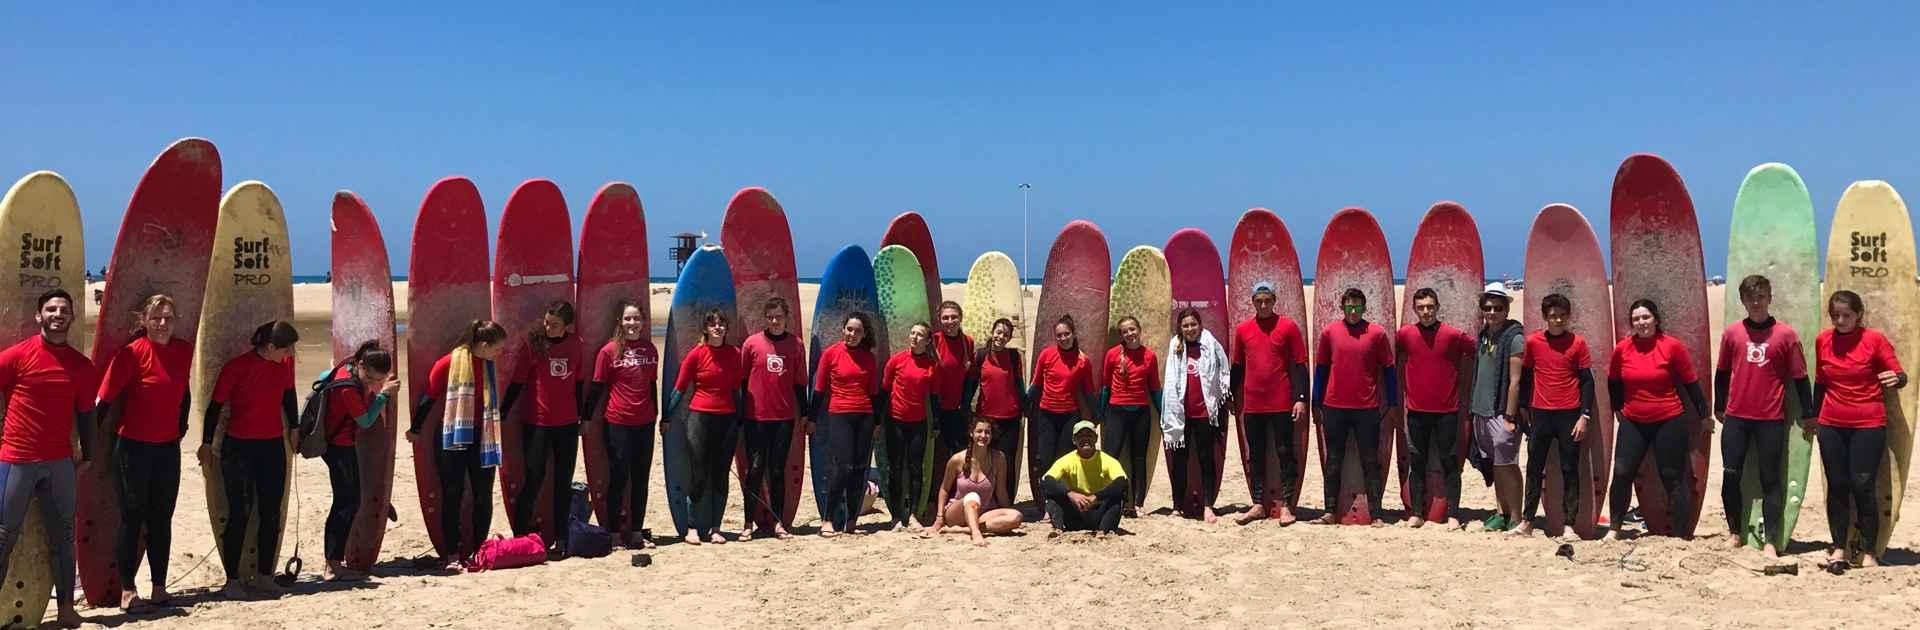 Surfkurs ,Cadiz, Andalusien, Conil, El Palmar